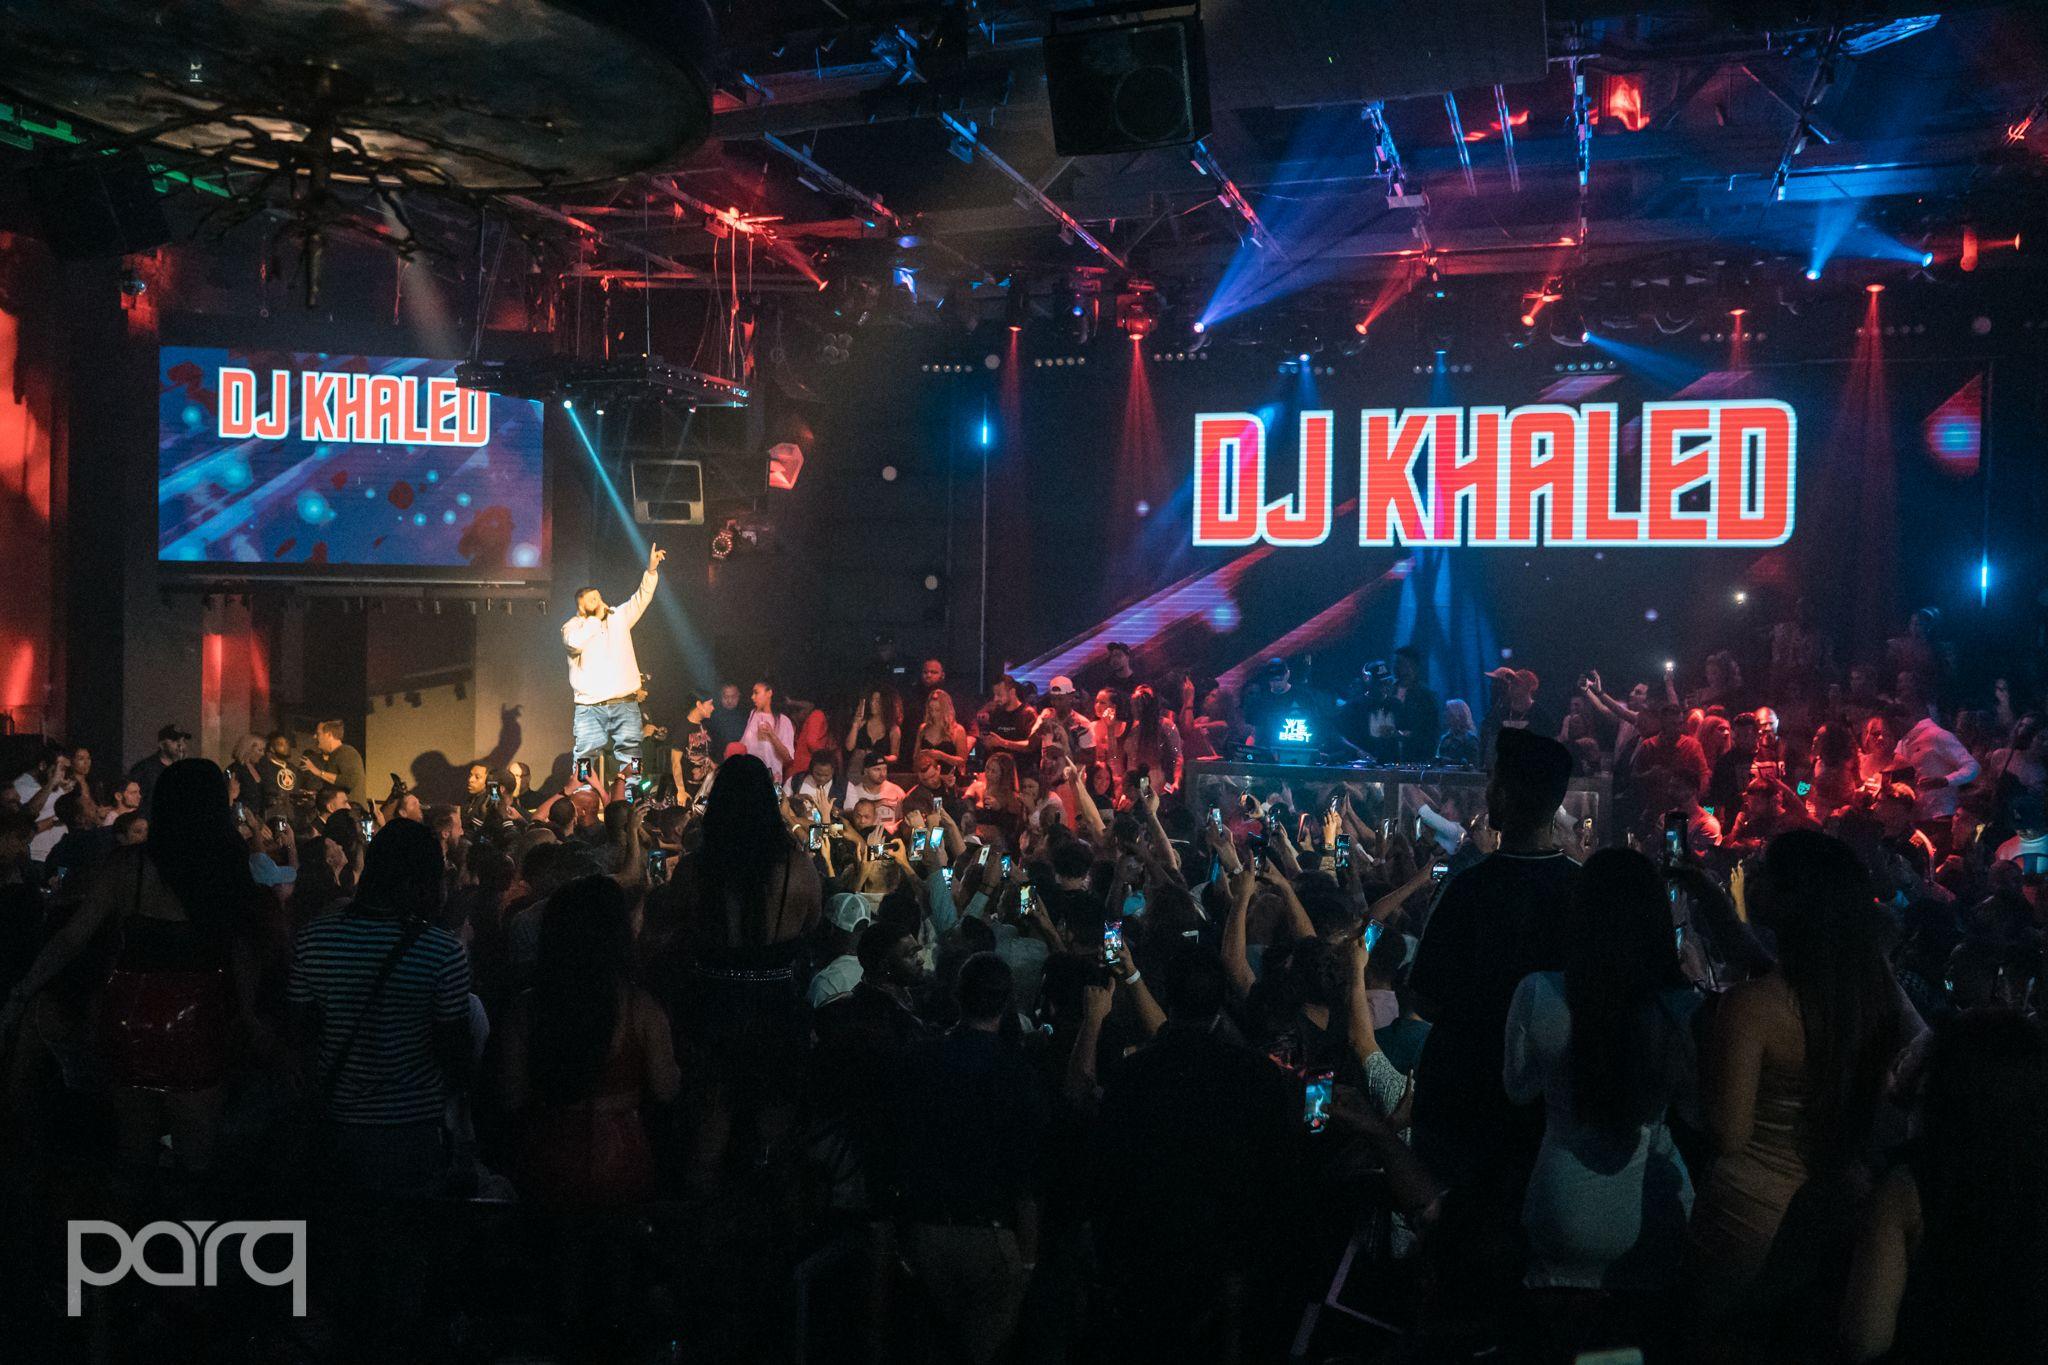 09.27.18 Parq - DJ Khaled-20.jpg